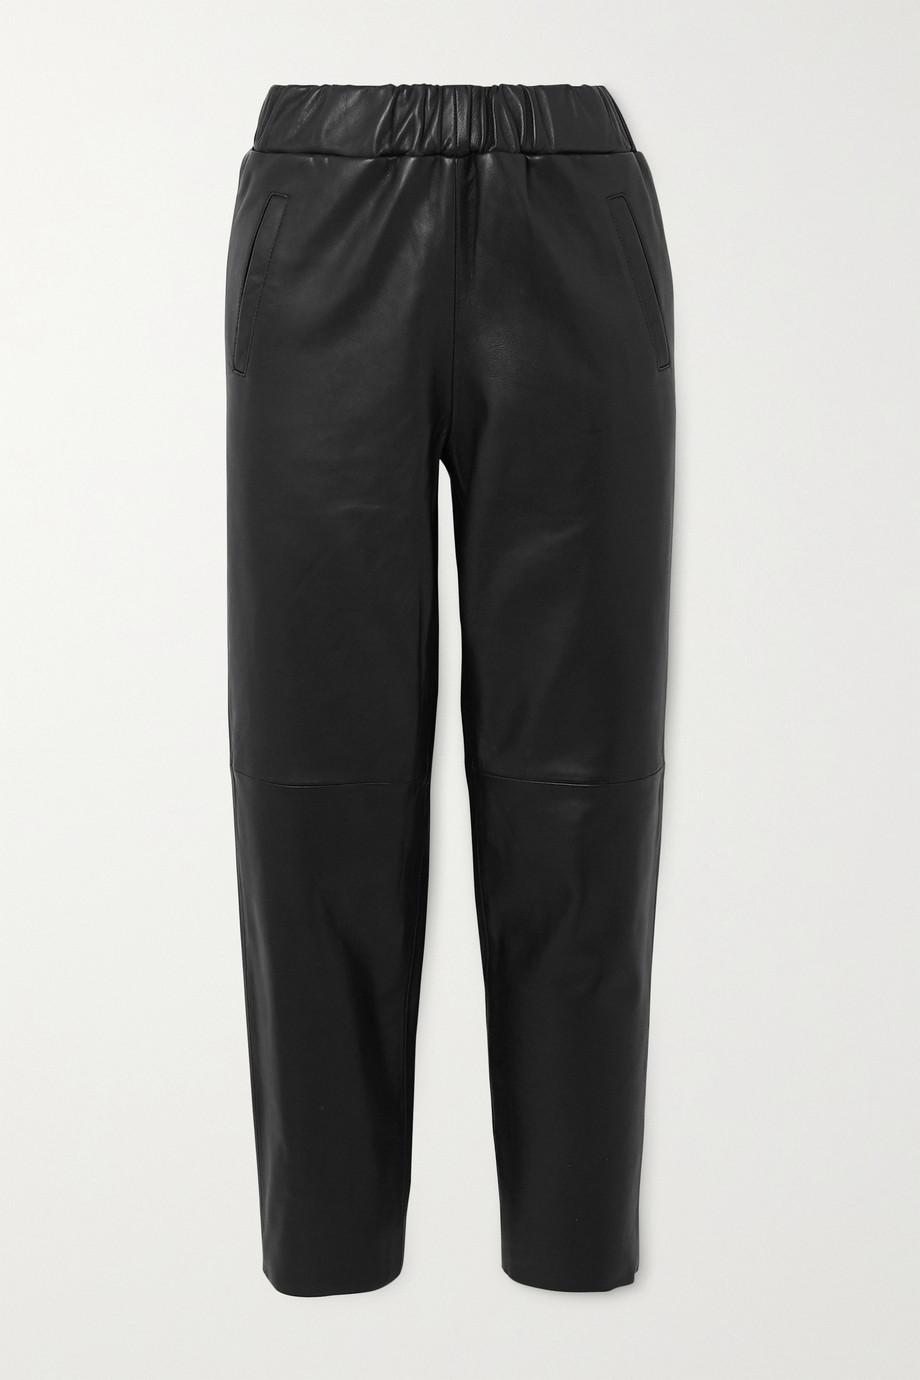 Stand Studio Noni leather track pants